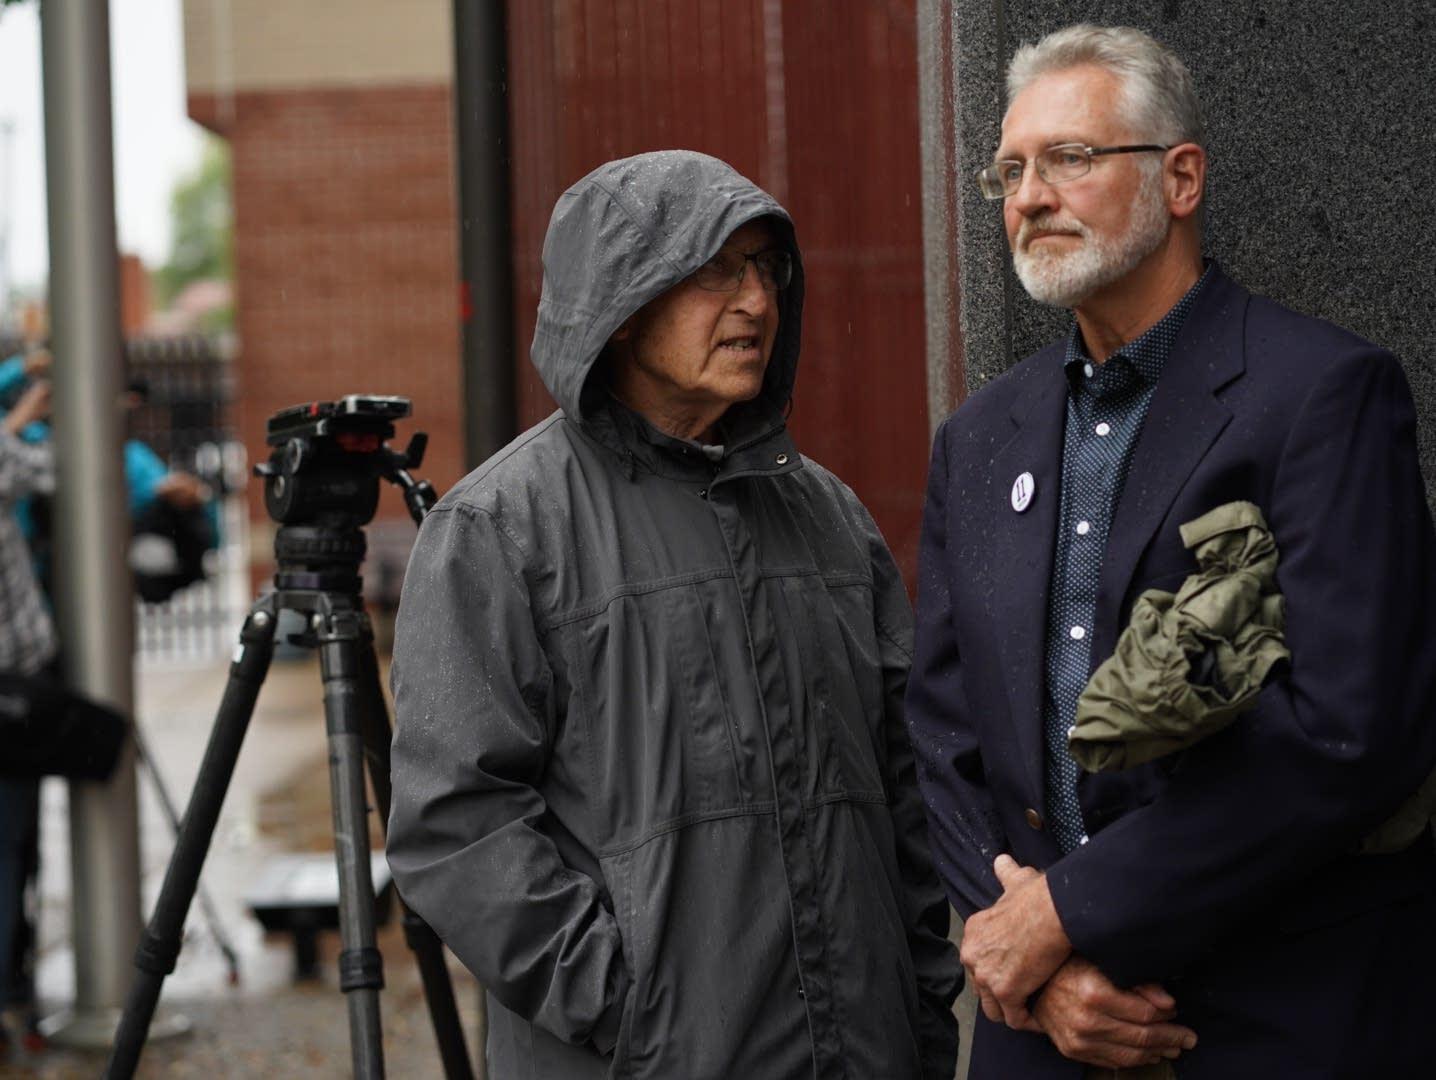 Former FBI agent Al Garber stands with Jerry Wetterling